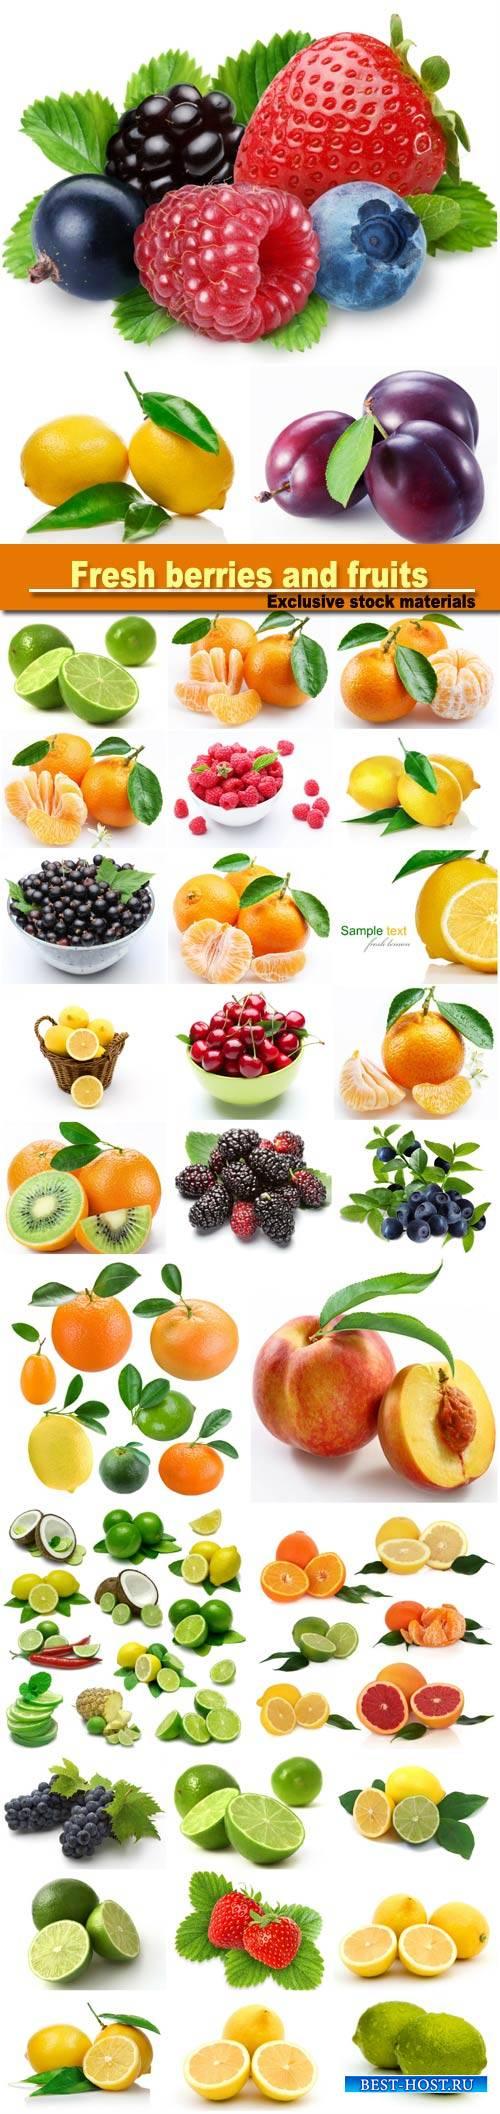 Fresh berries and fruits: orange, lemon, strawberry, watermelon, raspberry, ...